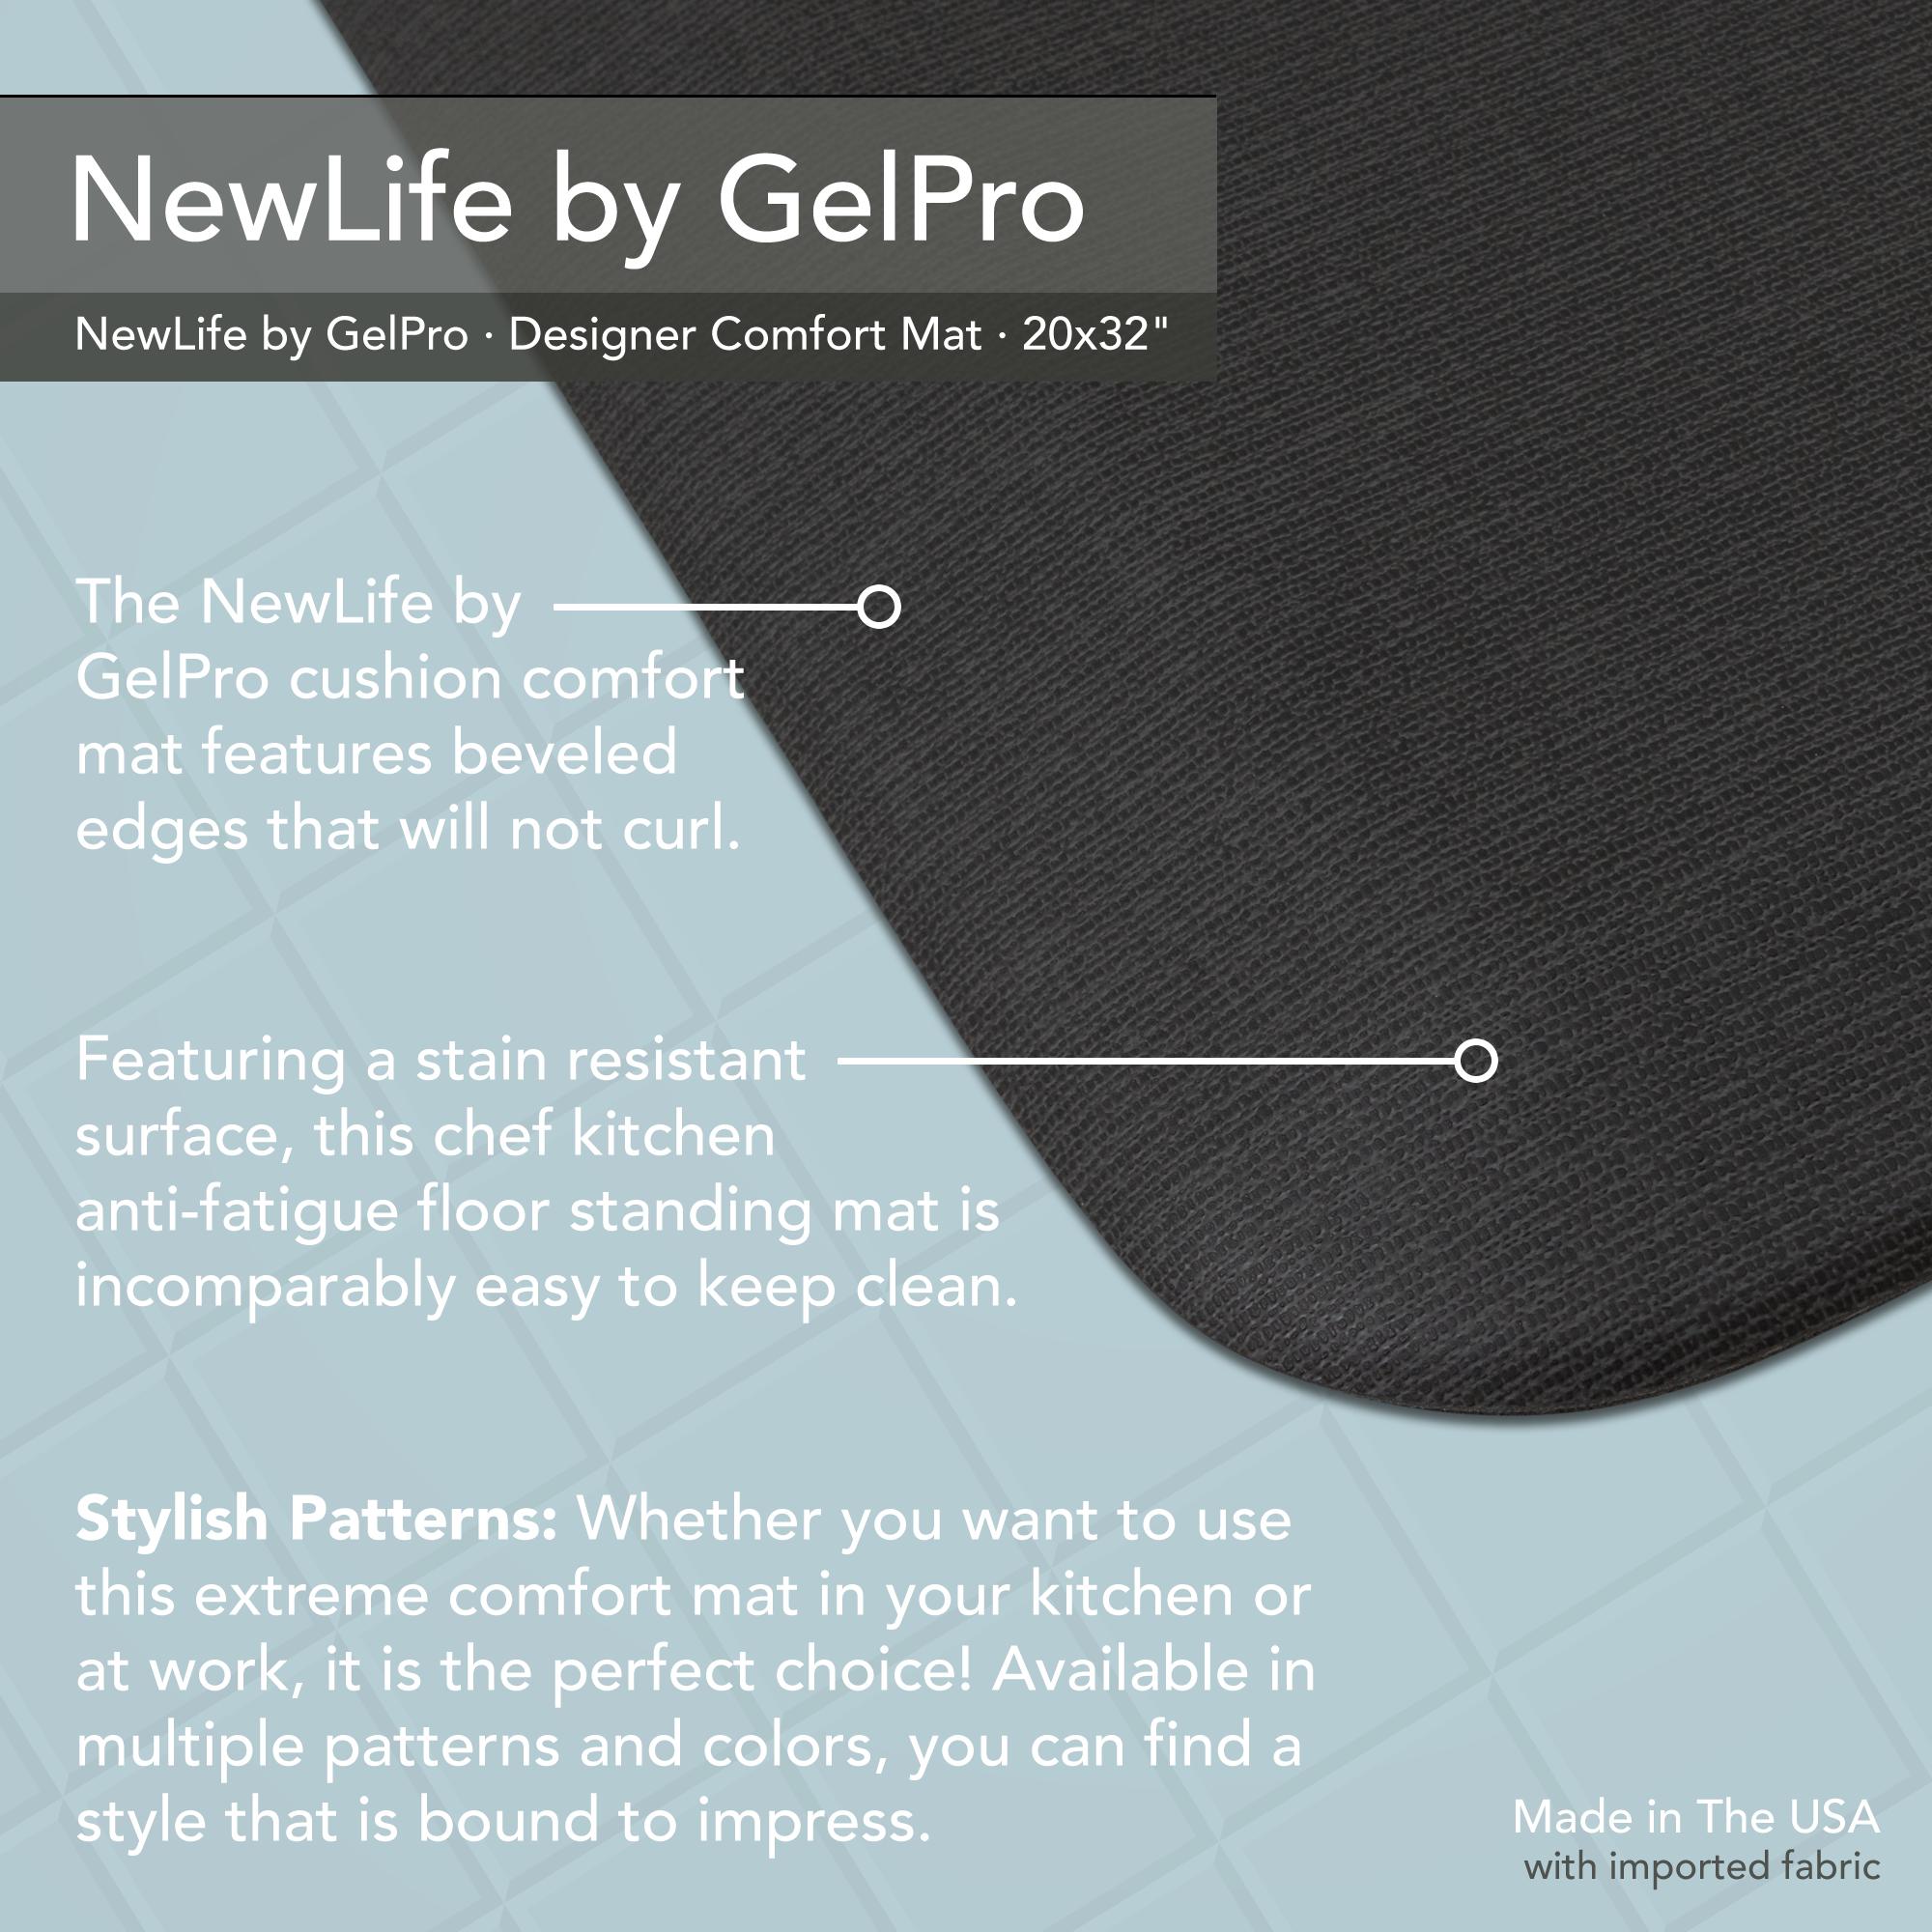 GelPro Grasscloth Designer Comfort Kitchen Mat - Walmart.com